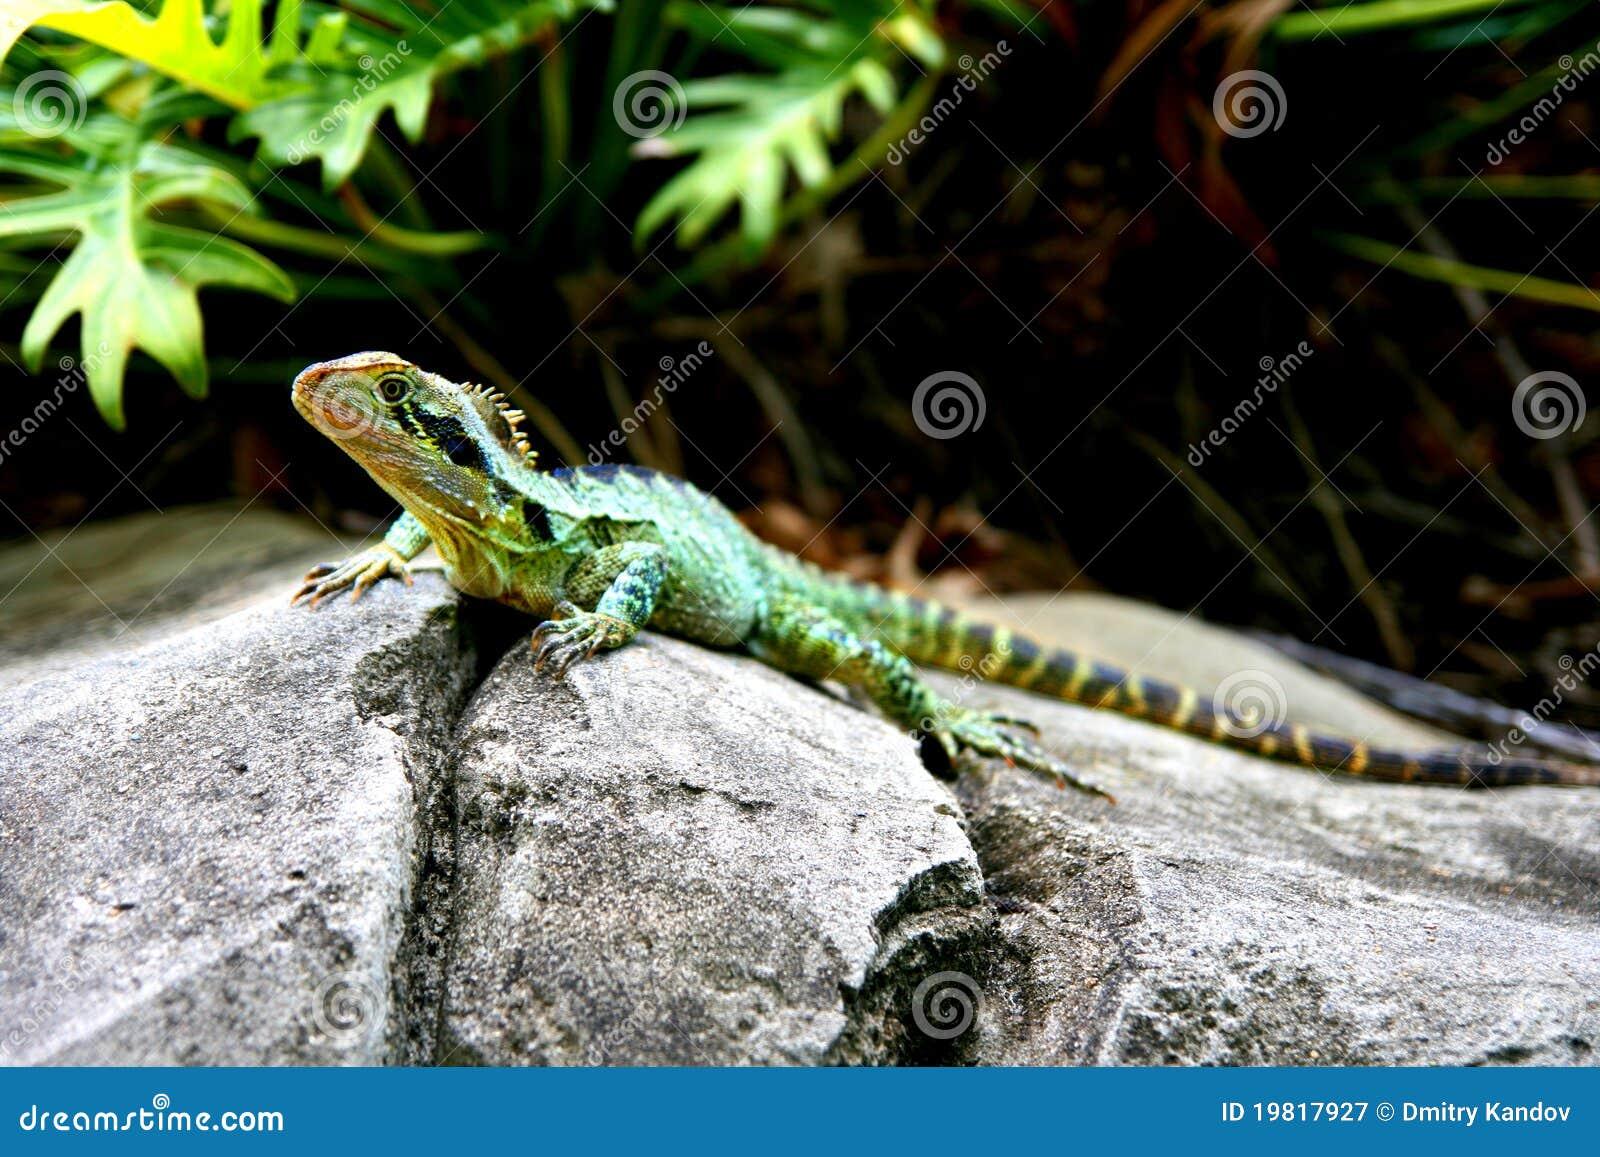 Australian Water Dragon Lizard: Australian Water Dragon Royalty Free Stock